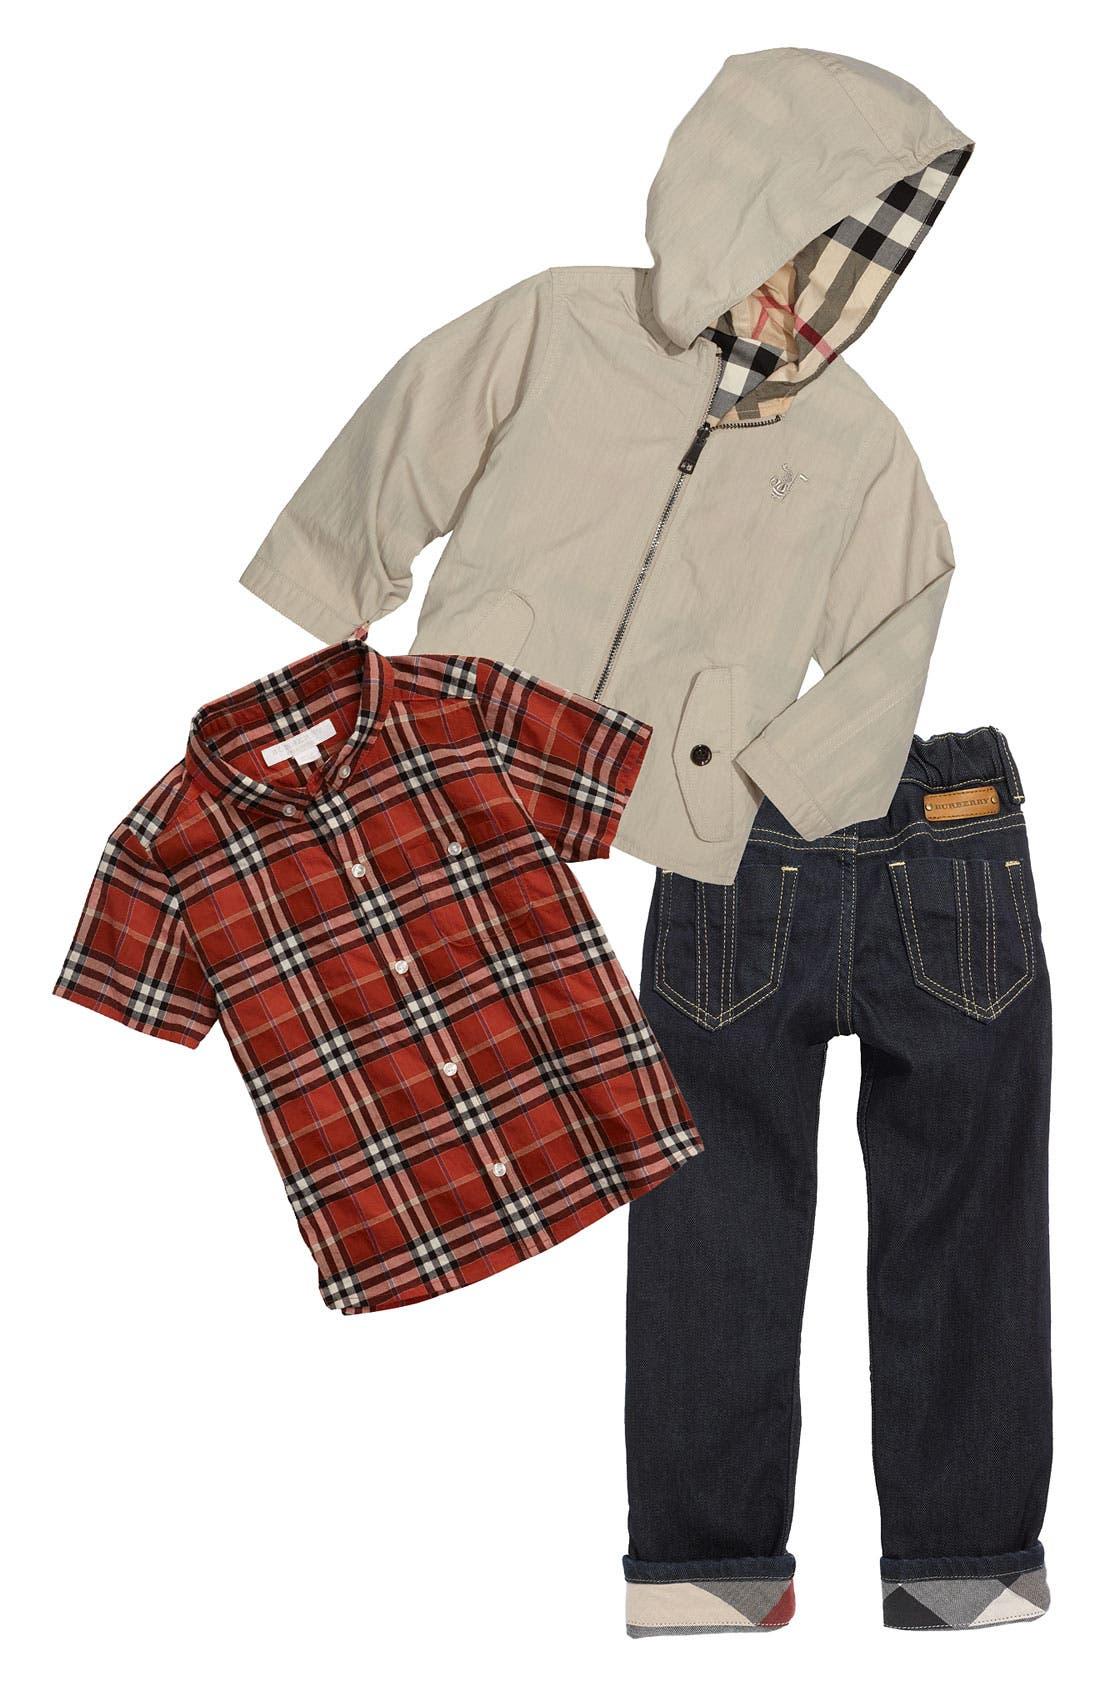 Main Image - Burberry Jacket, Shirt & Jeans (Toddler)